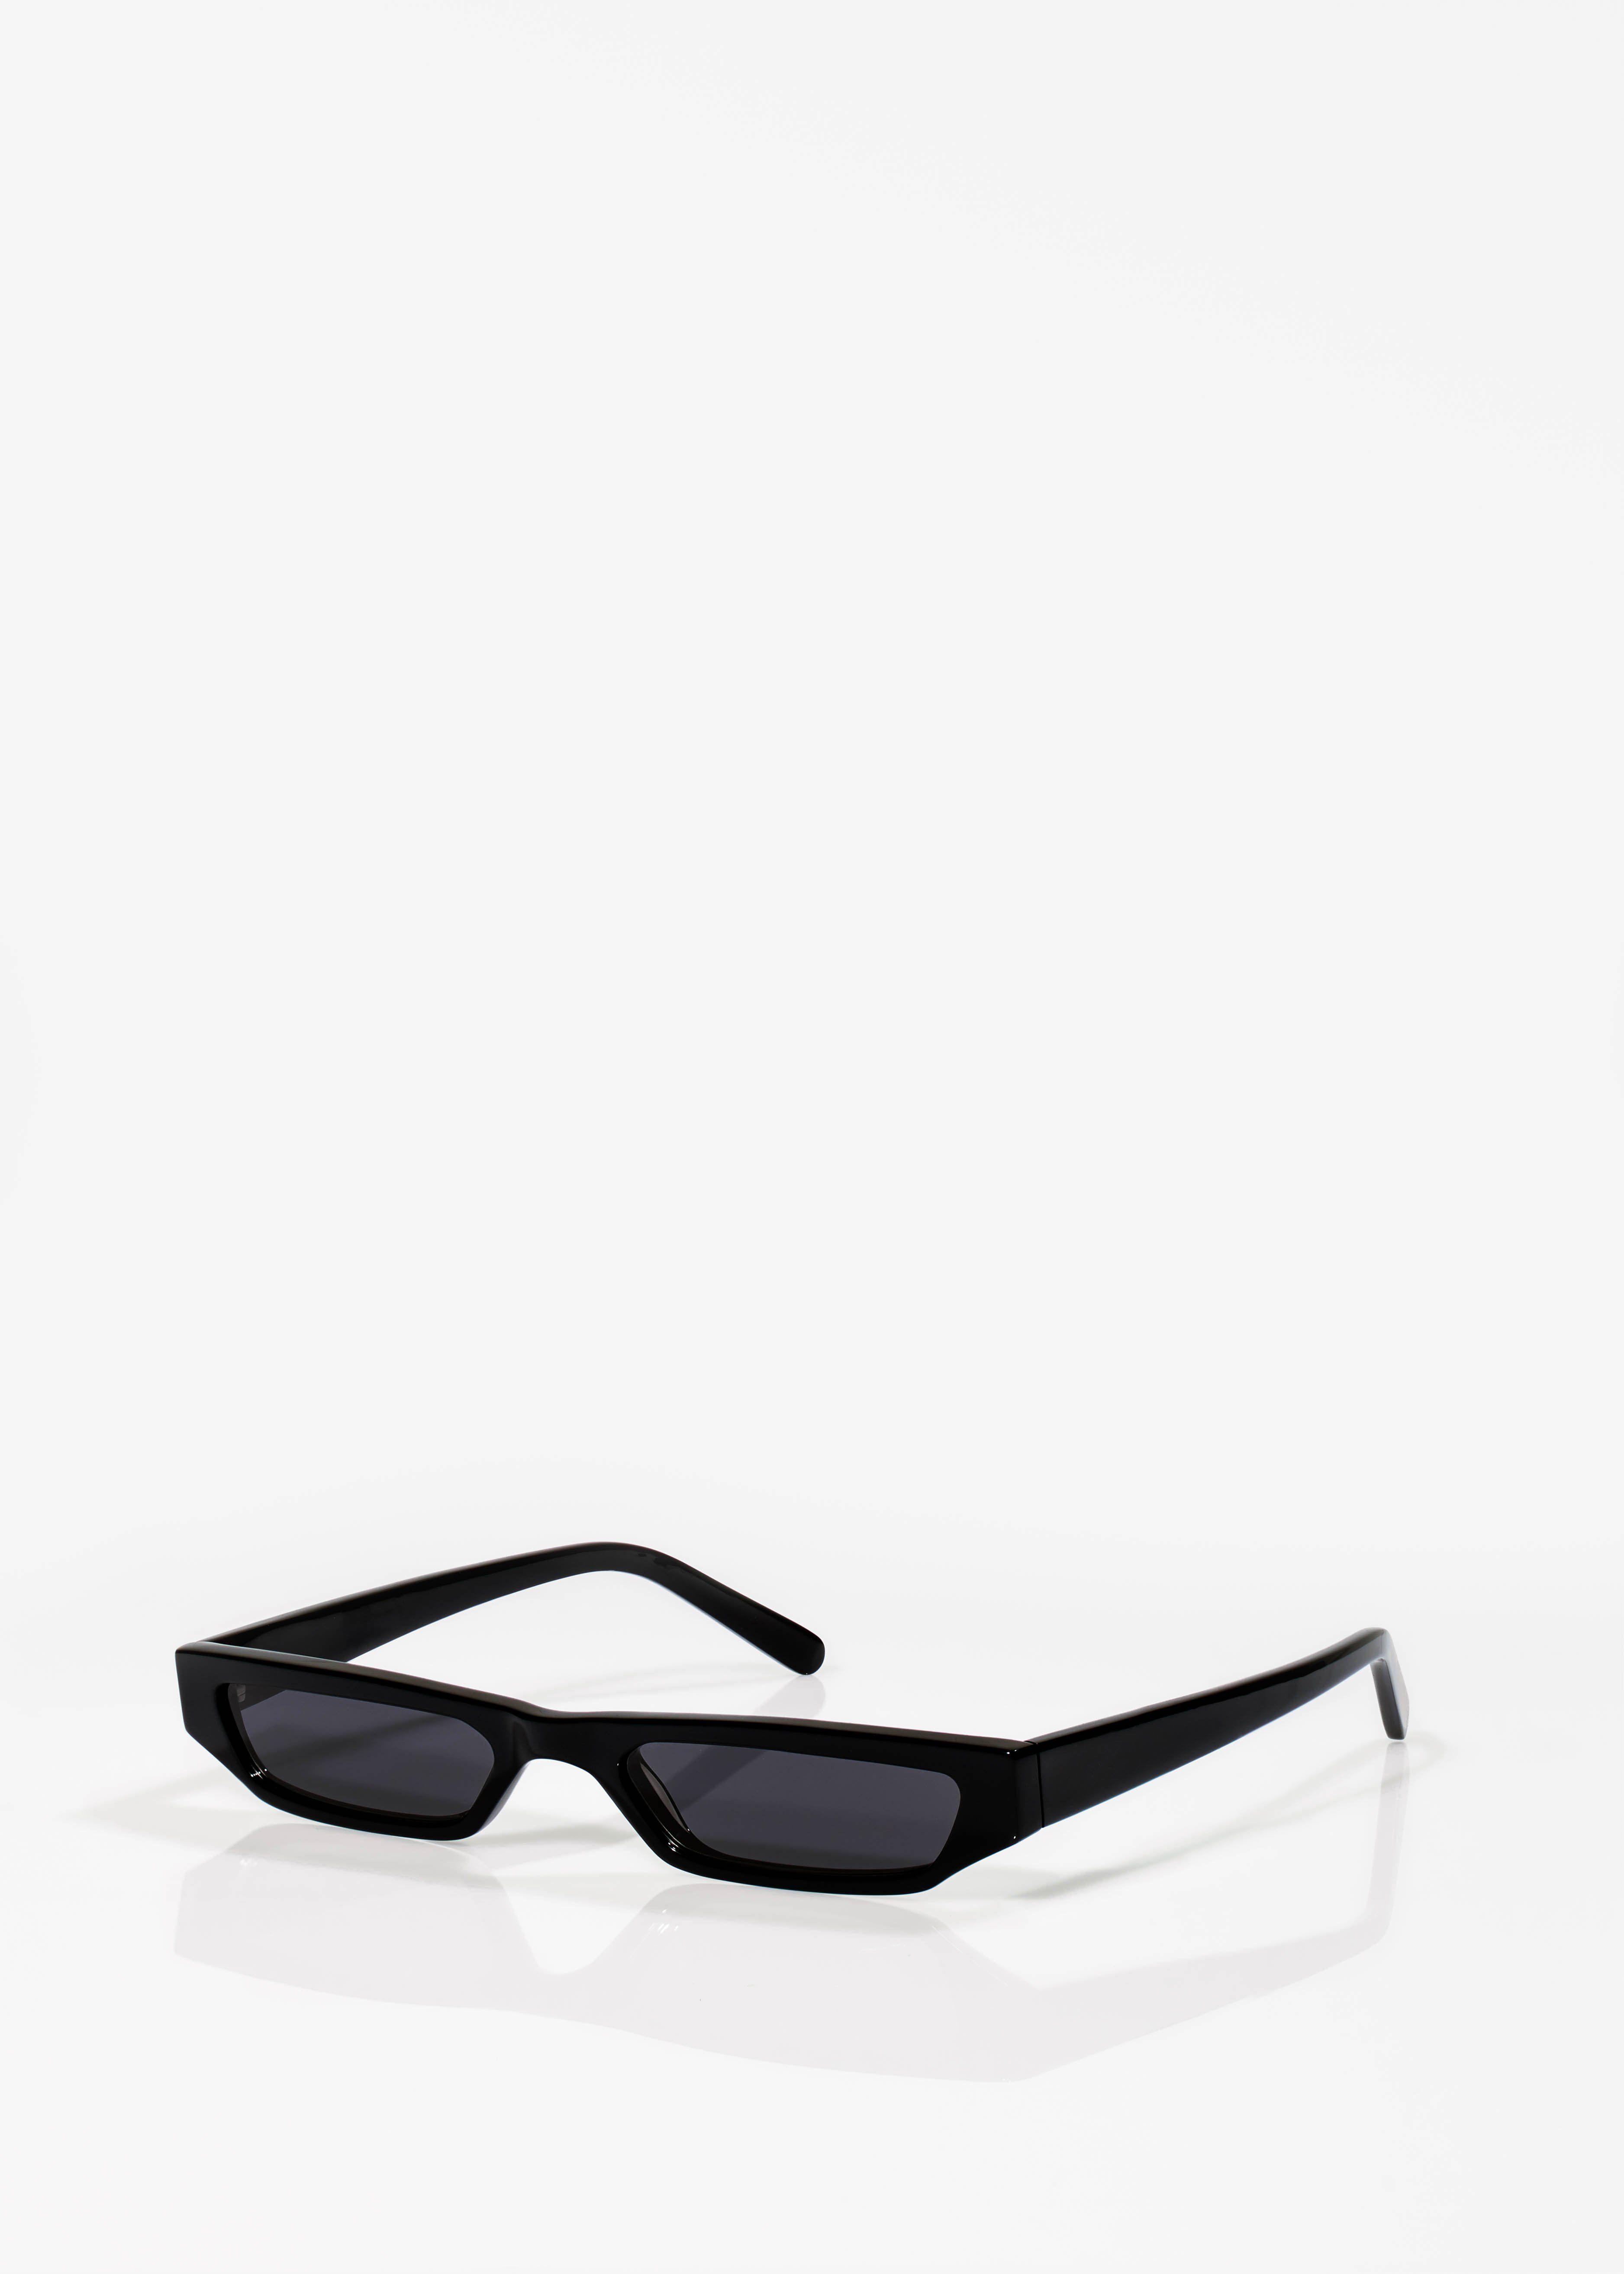 1bf8b4ea06e CMMN SWDN x Ace   Tate Jet Black Pris Sunglasses